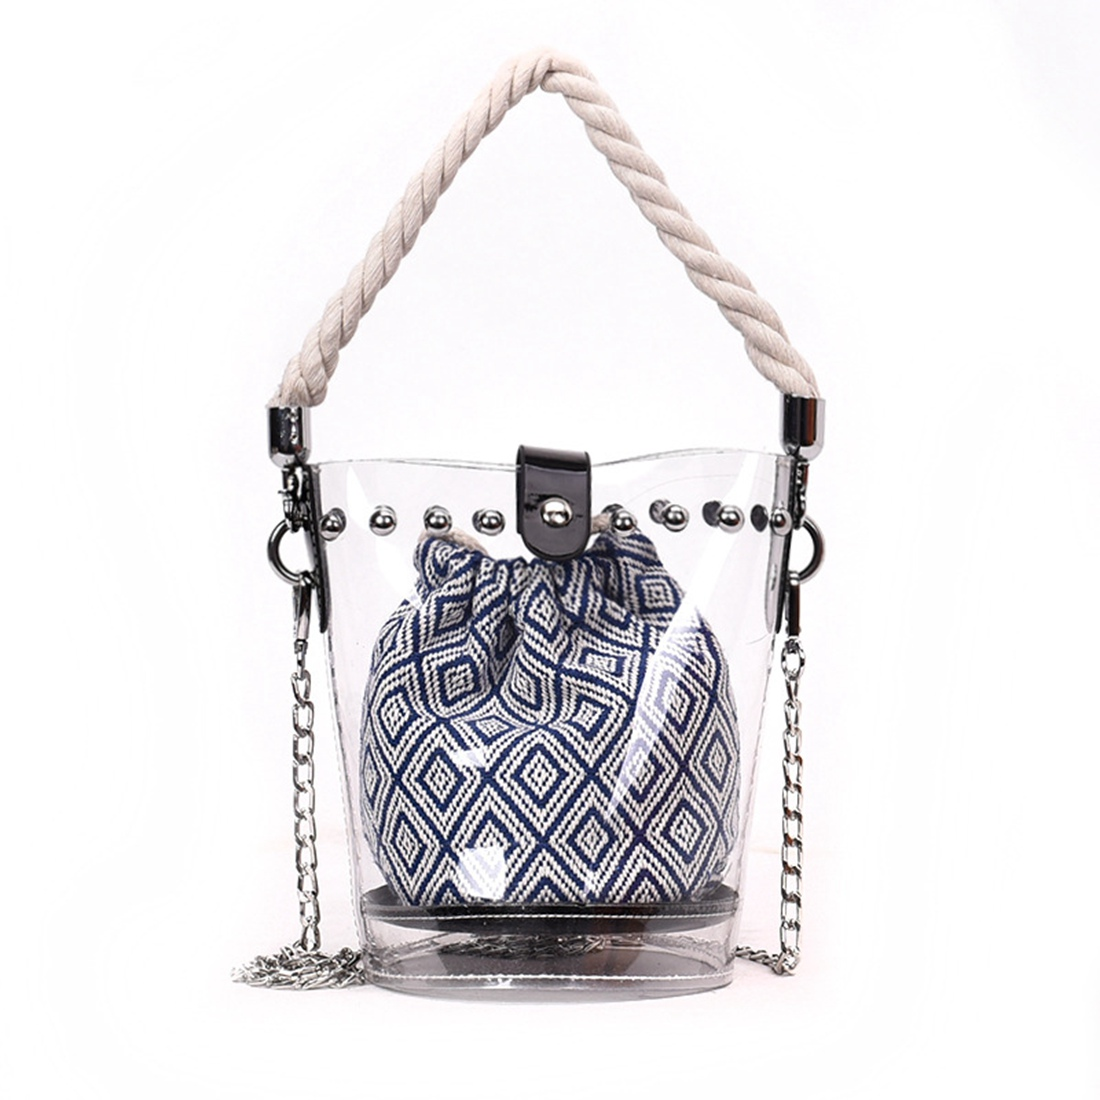 FGGS Blue new fashion PVC chain diagonal handbag fashion transparent hit color diamond rivet hemp rope shoulder diagonal mothe